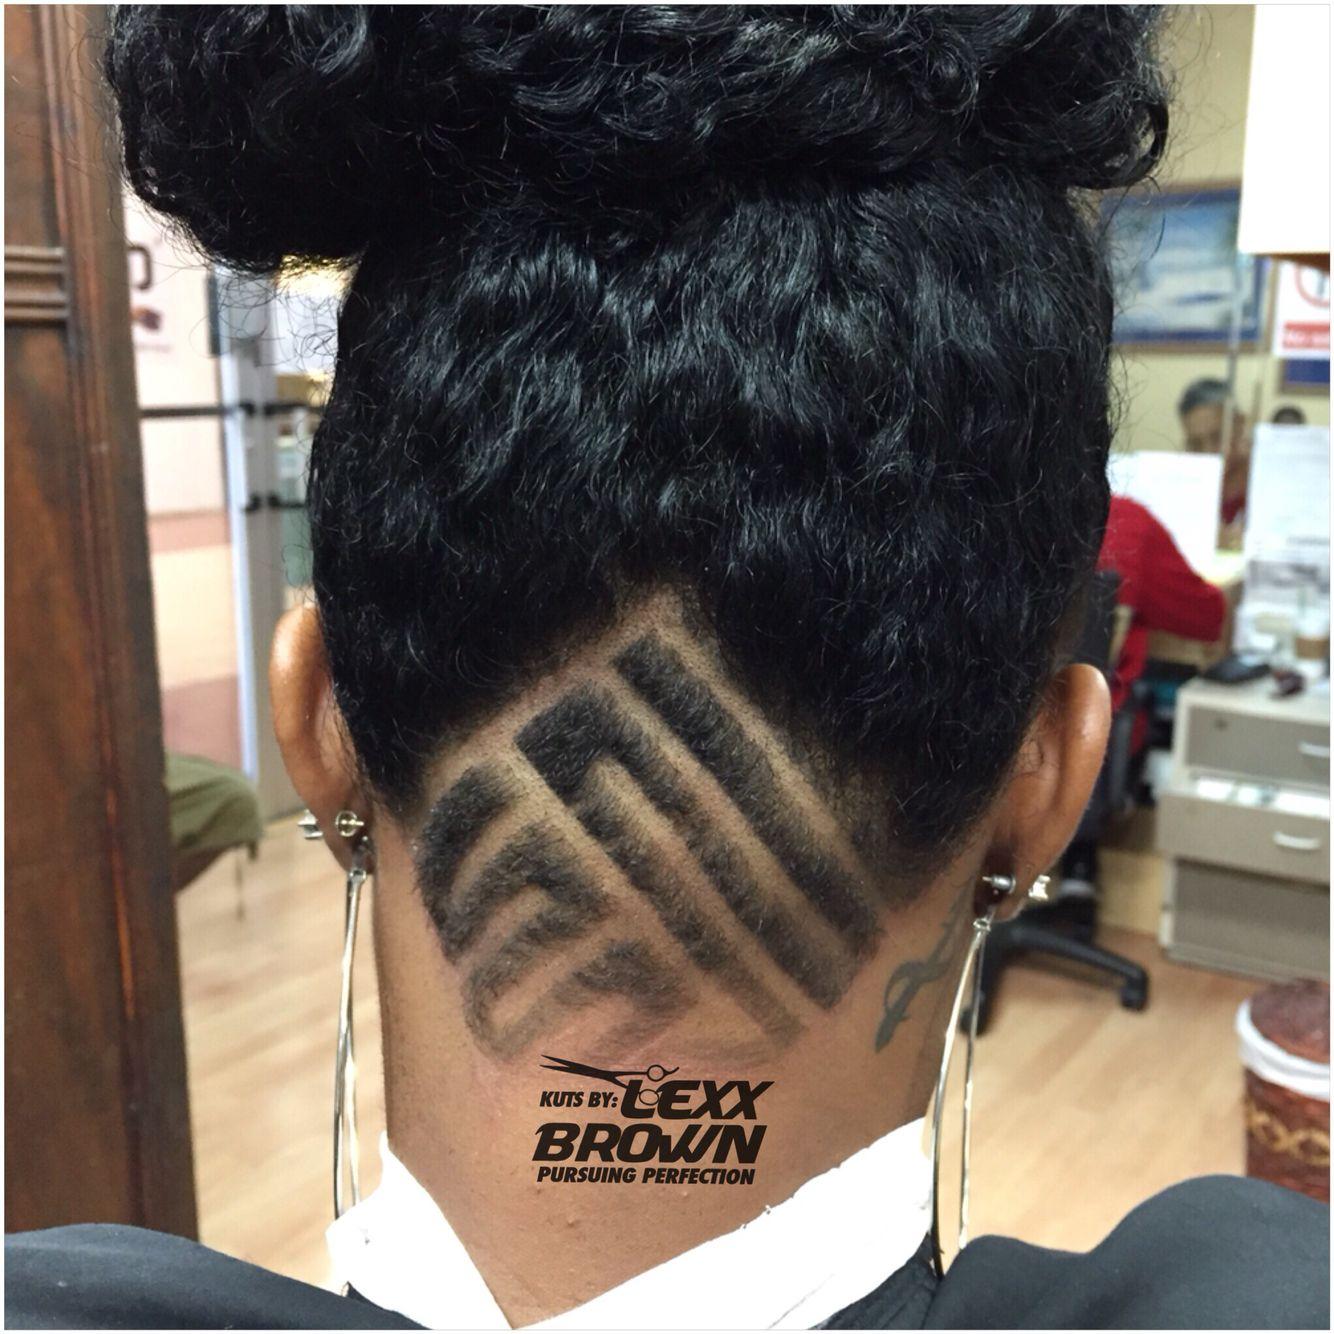 kuts by #lexxbrown. she got a undercut with design #hair #hairart